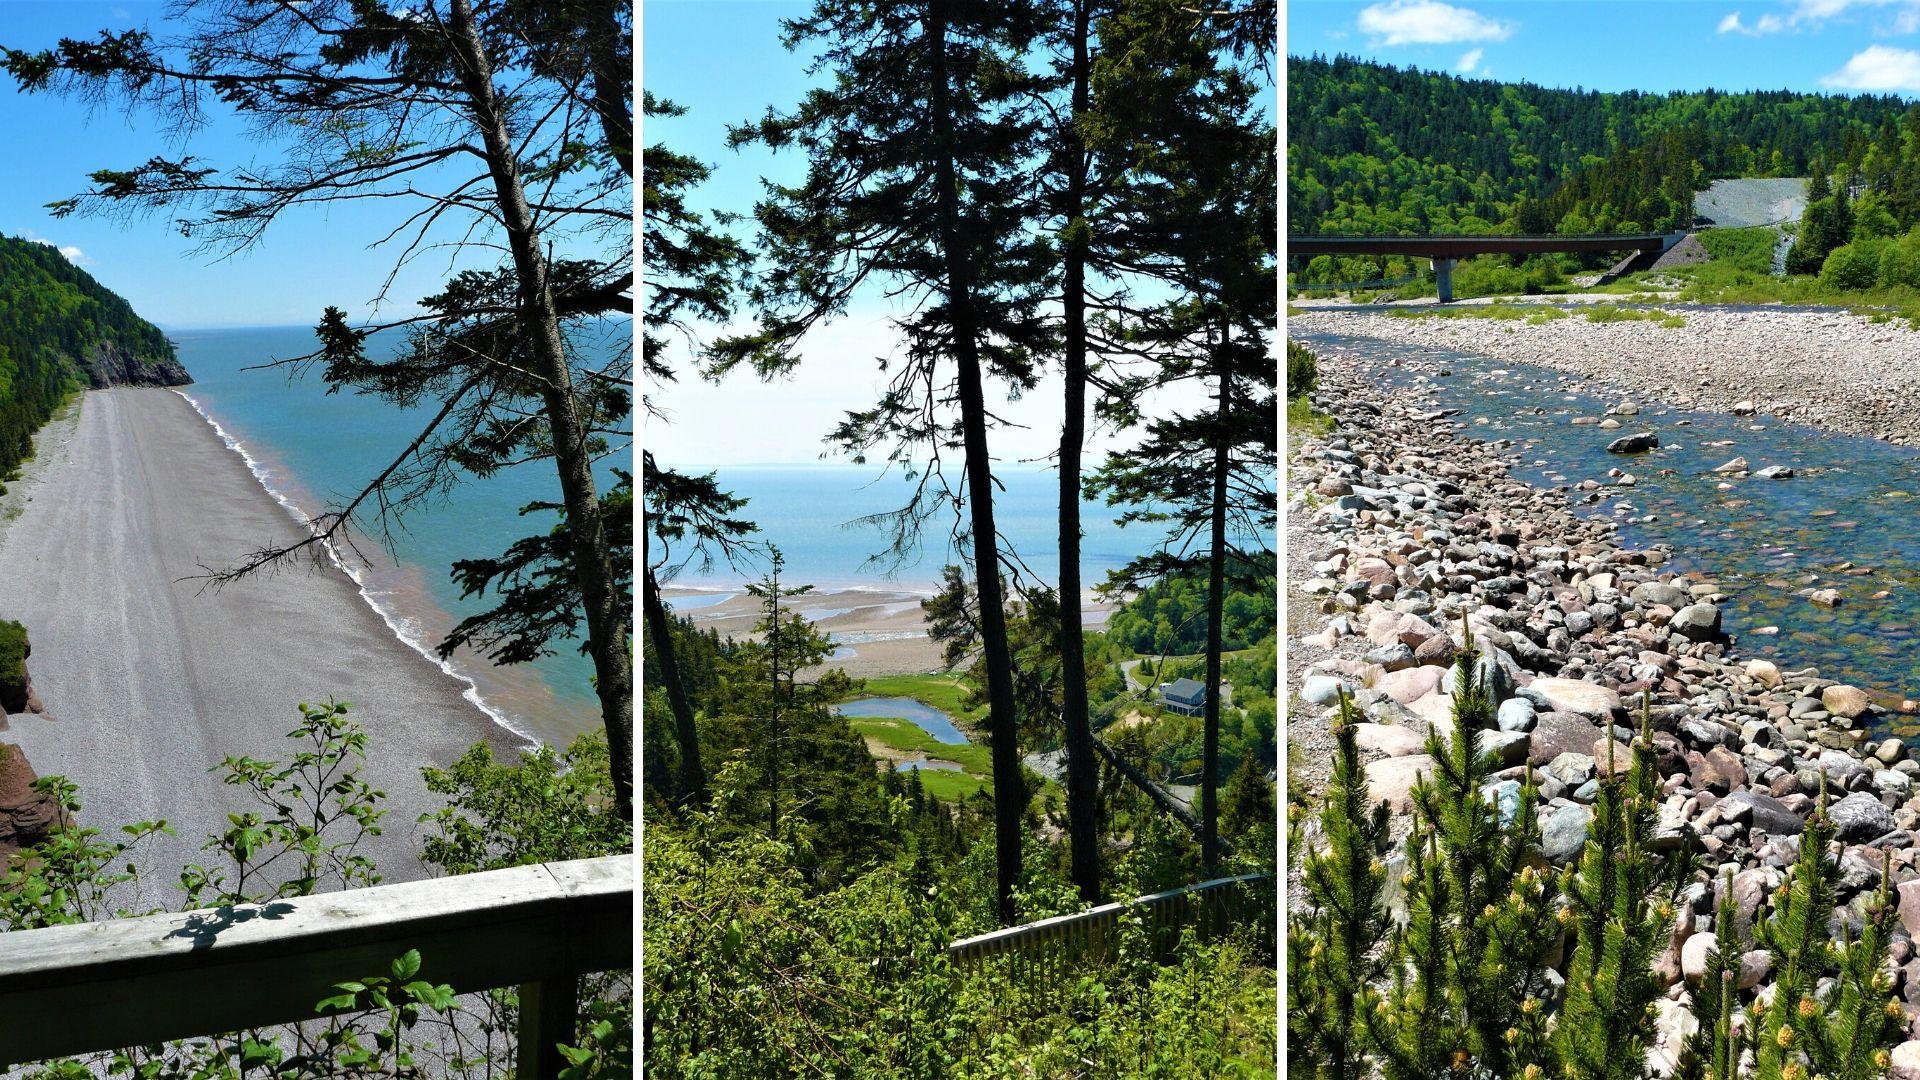 Visiter promenade sentier Fundy Trail Parkway Beach voyage Nouveau-Brunswick